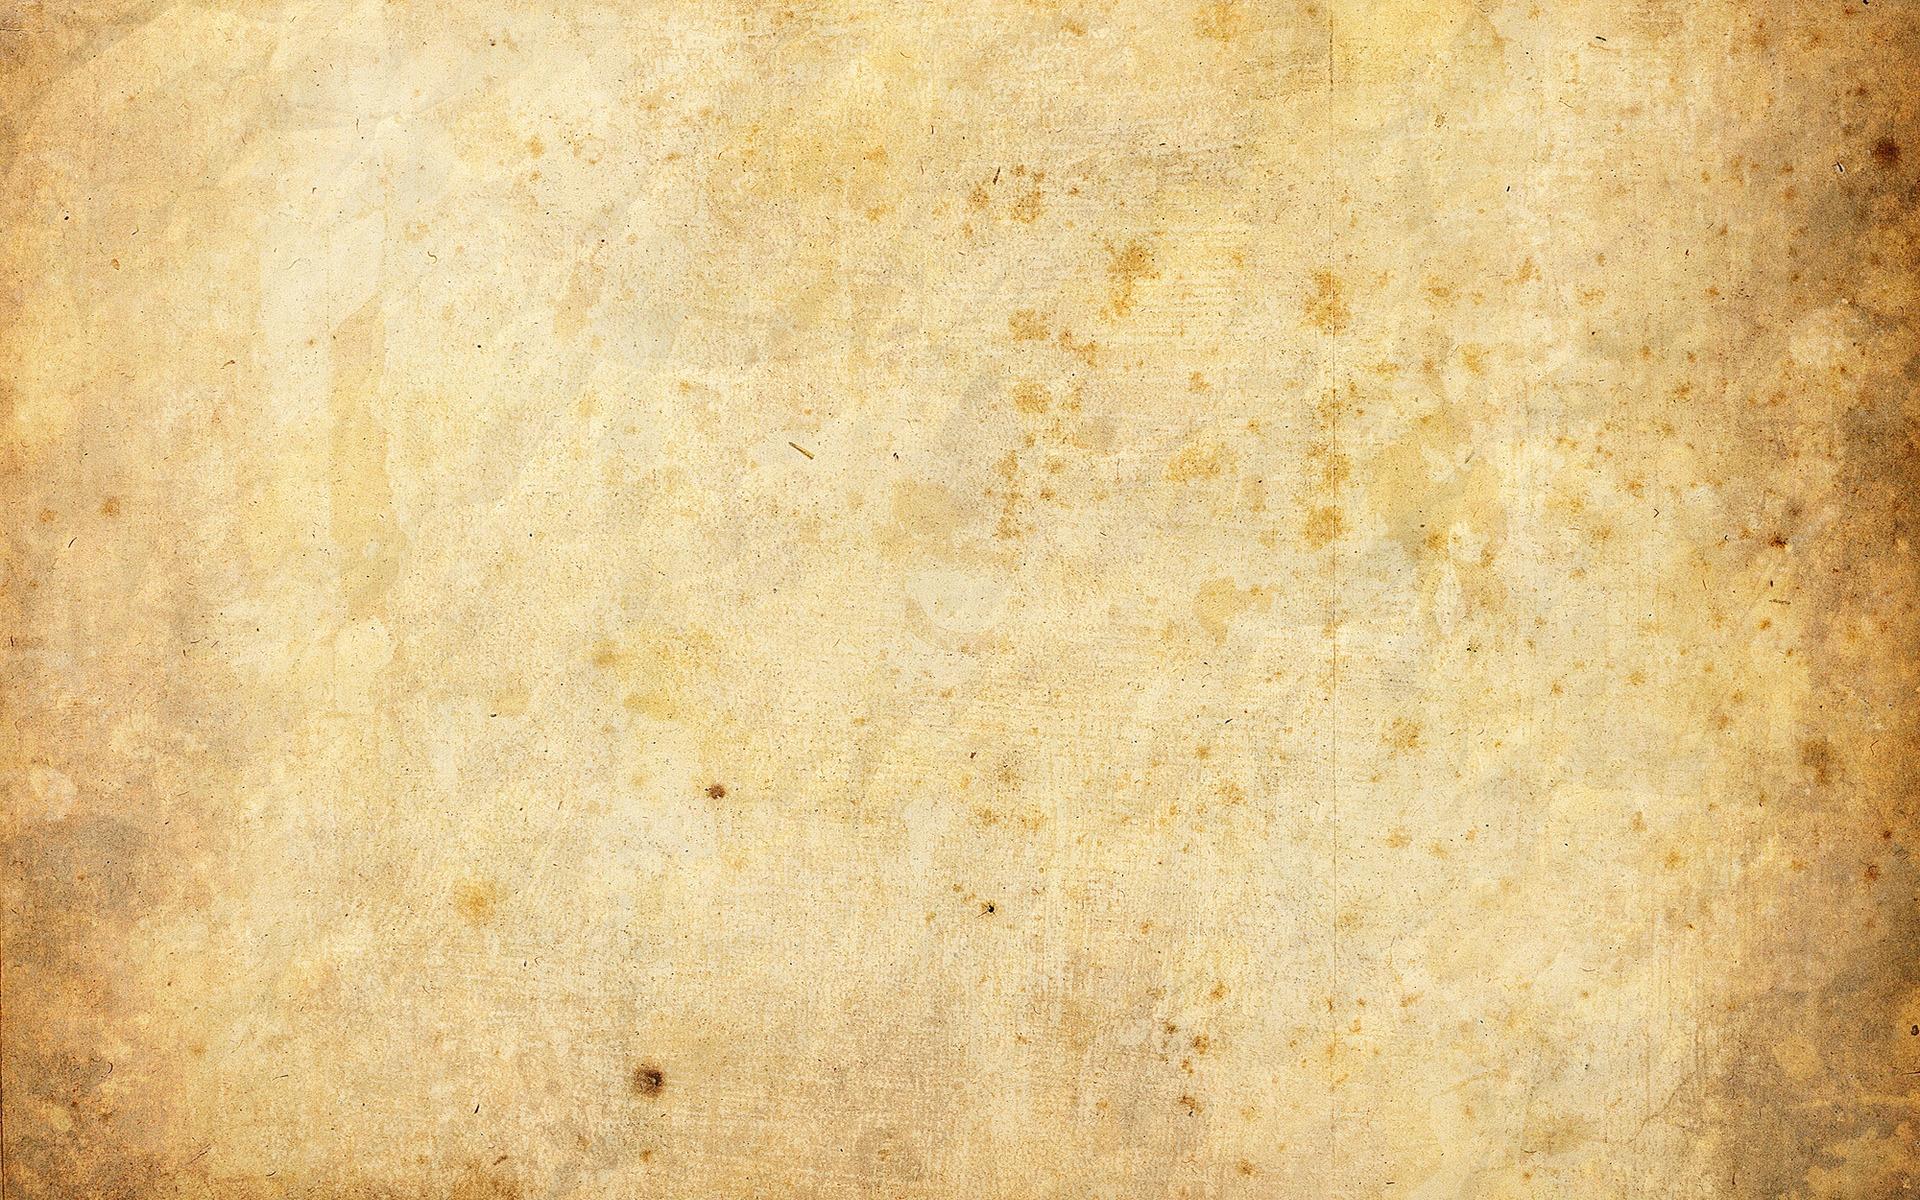 6809725-simple-vintage-backgrounds